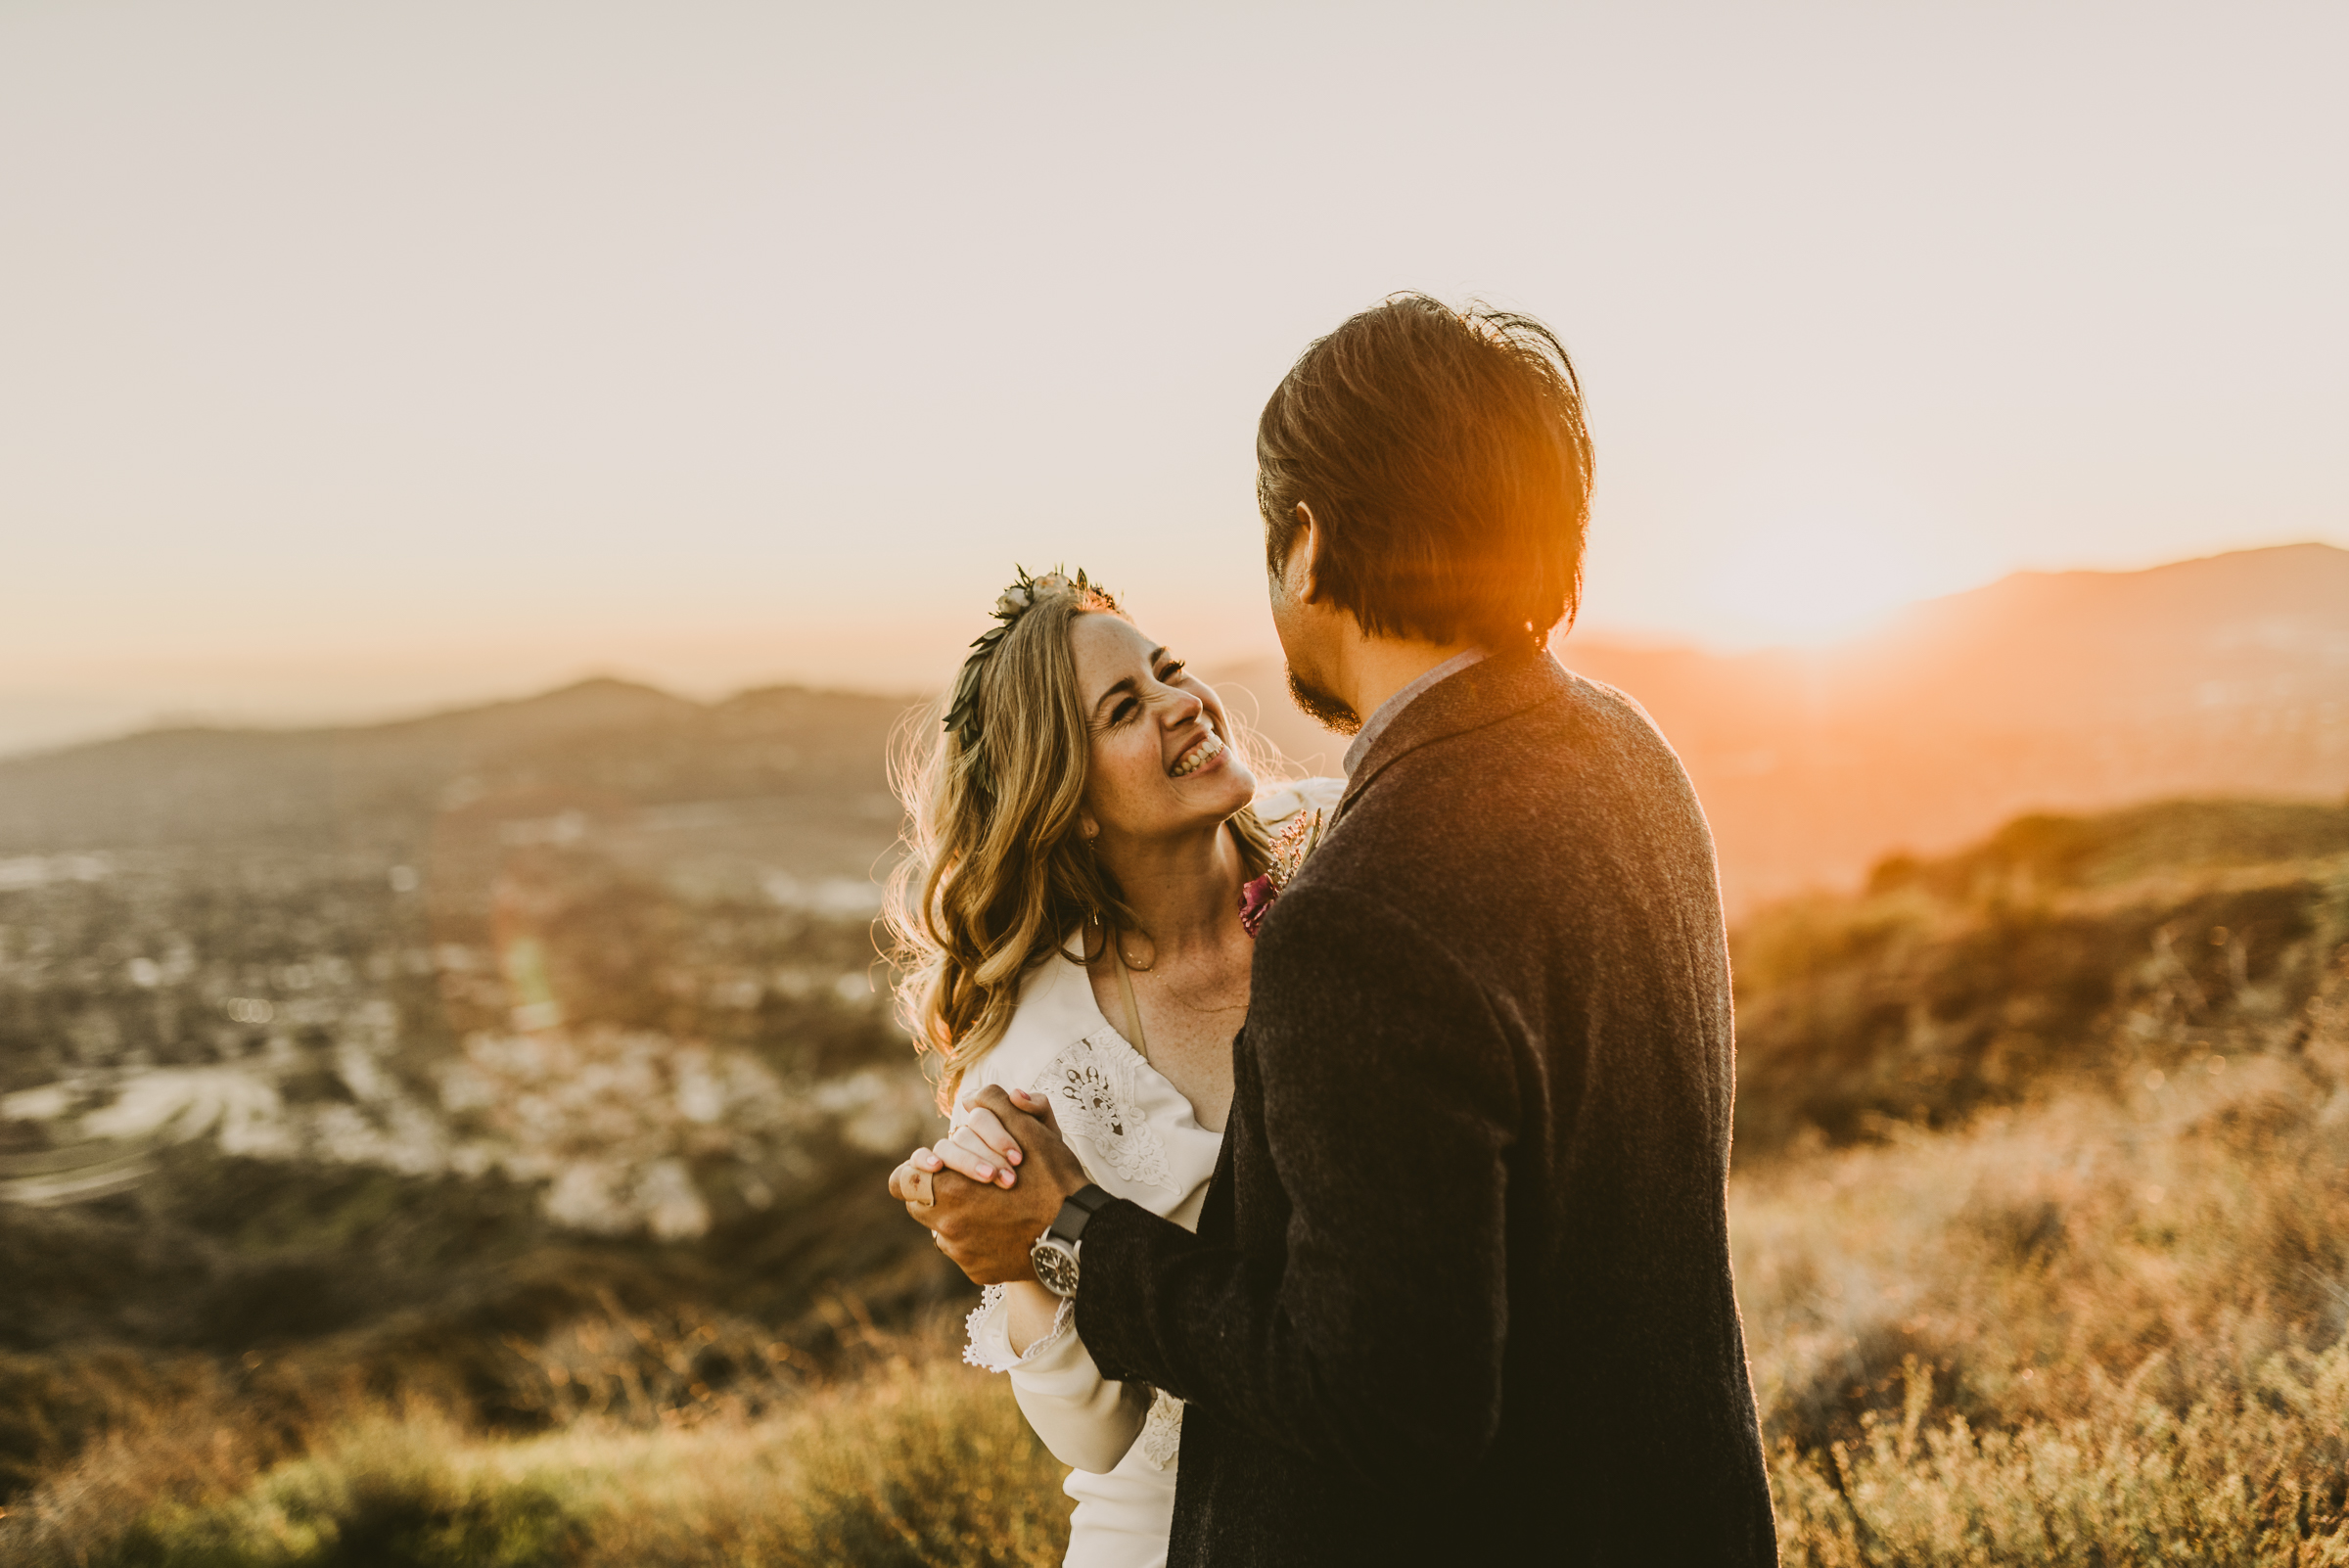 ©Isaiah + Taylor Photography - Intimate Elopement, Eaton Canyon, Los Angeles Wedding Photographer-100.jpg